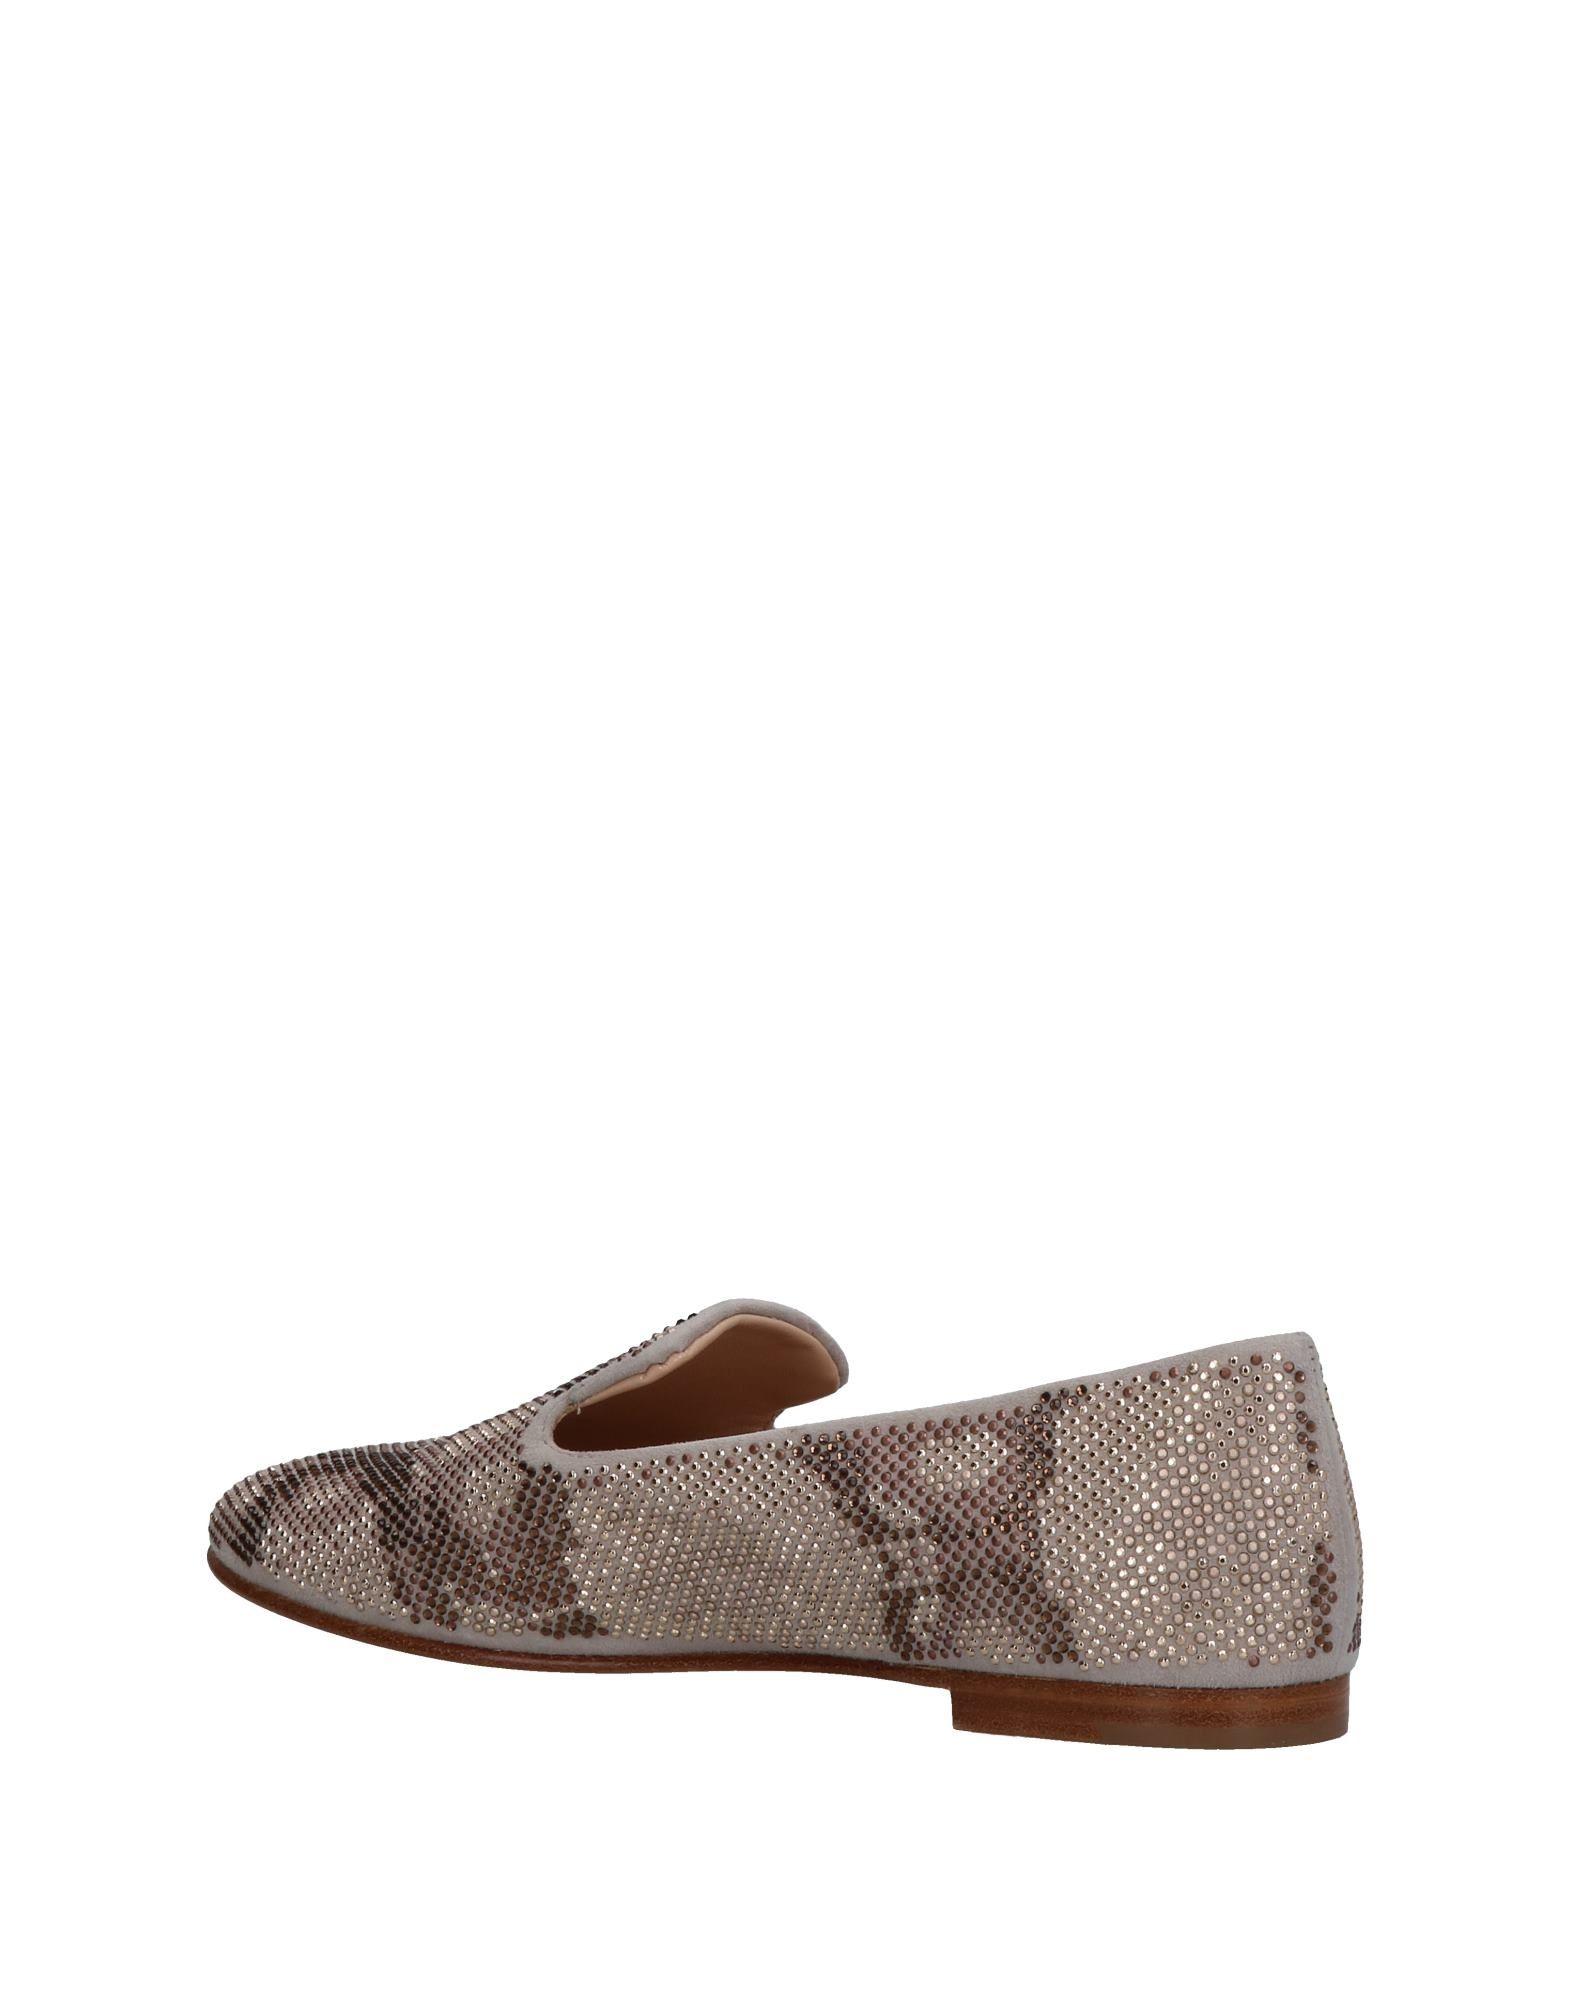 Giuseppe Zanotti Mokassins Damen  11356107SHGünstige gut aussehende Schuhe